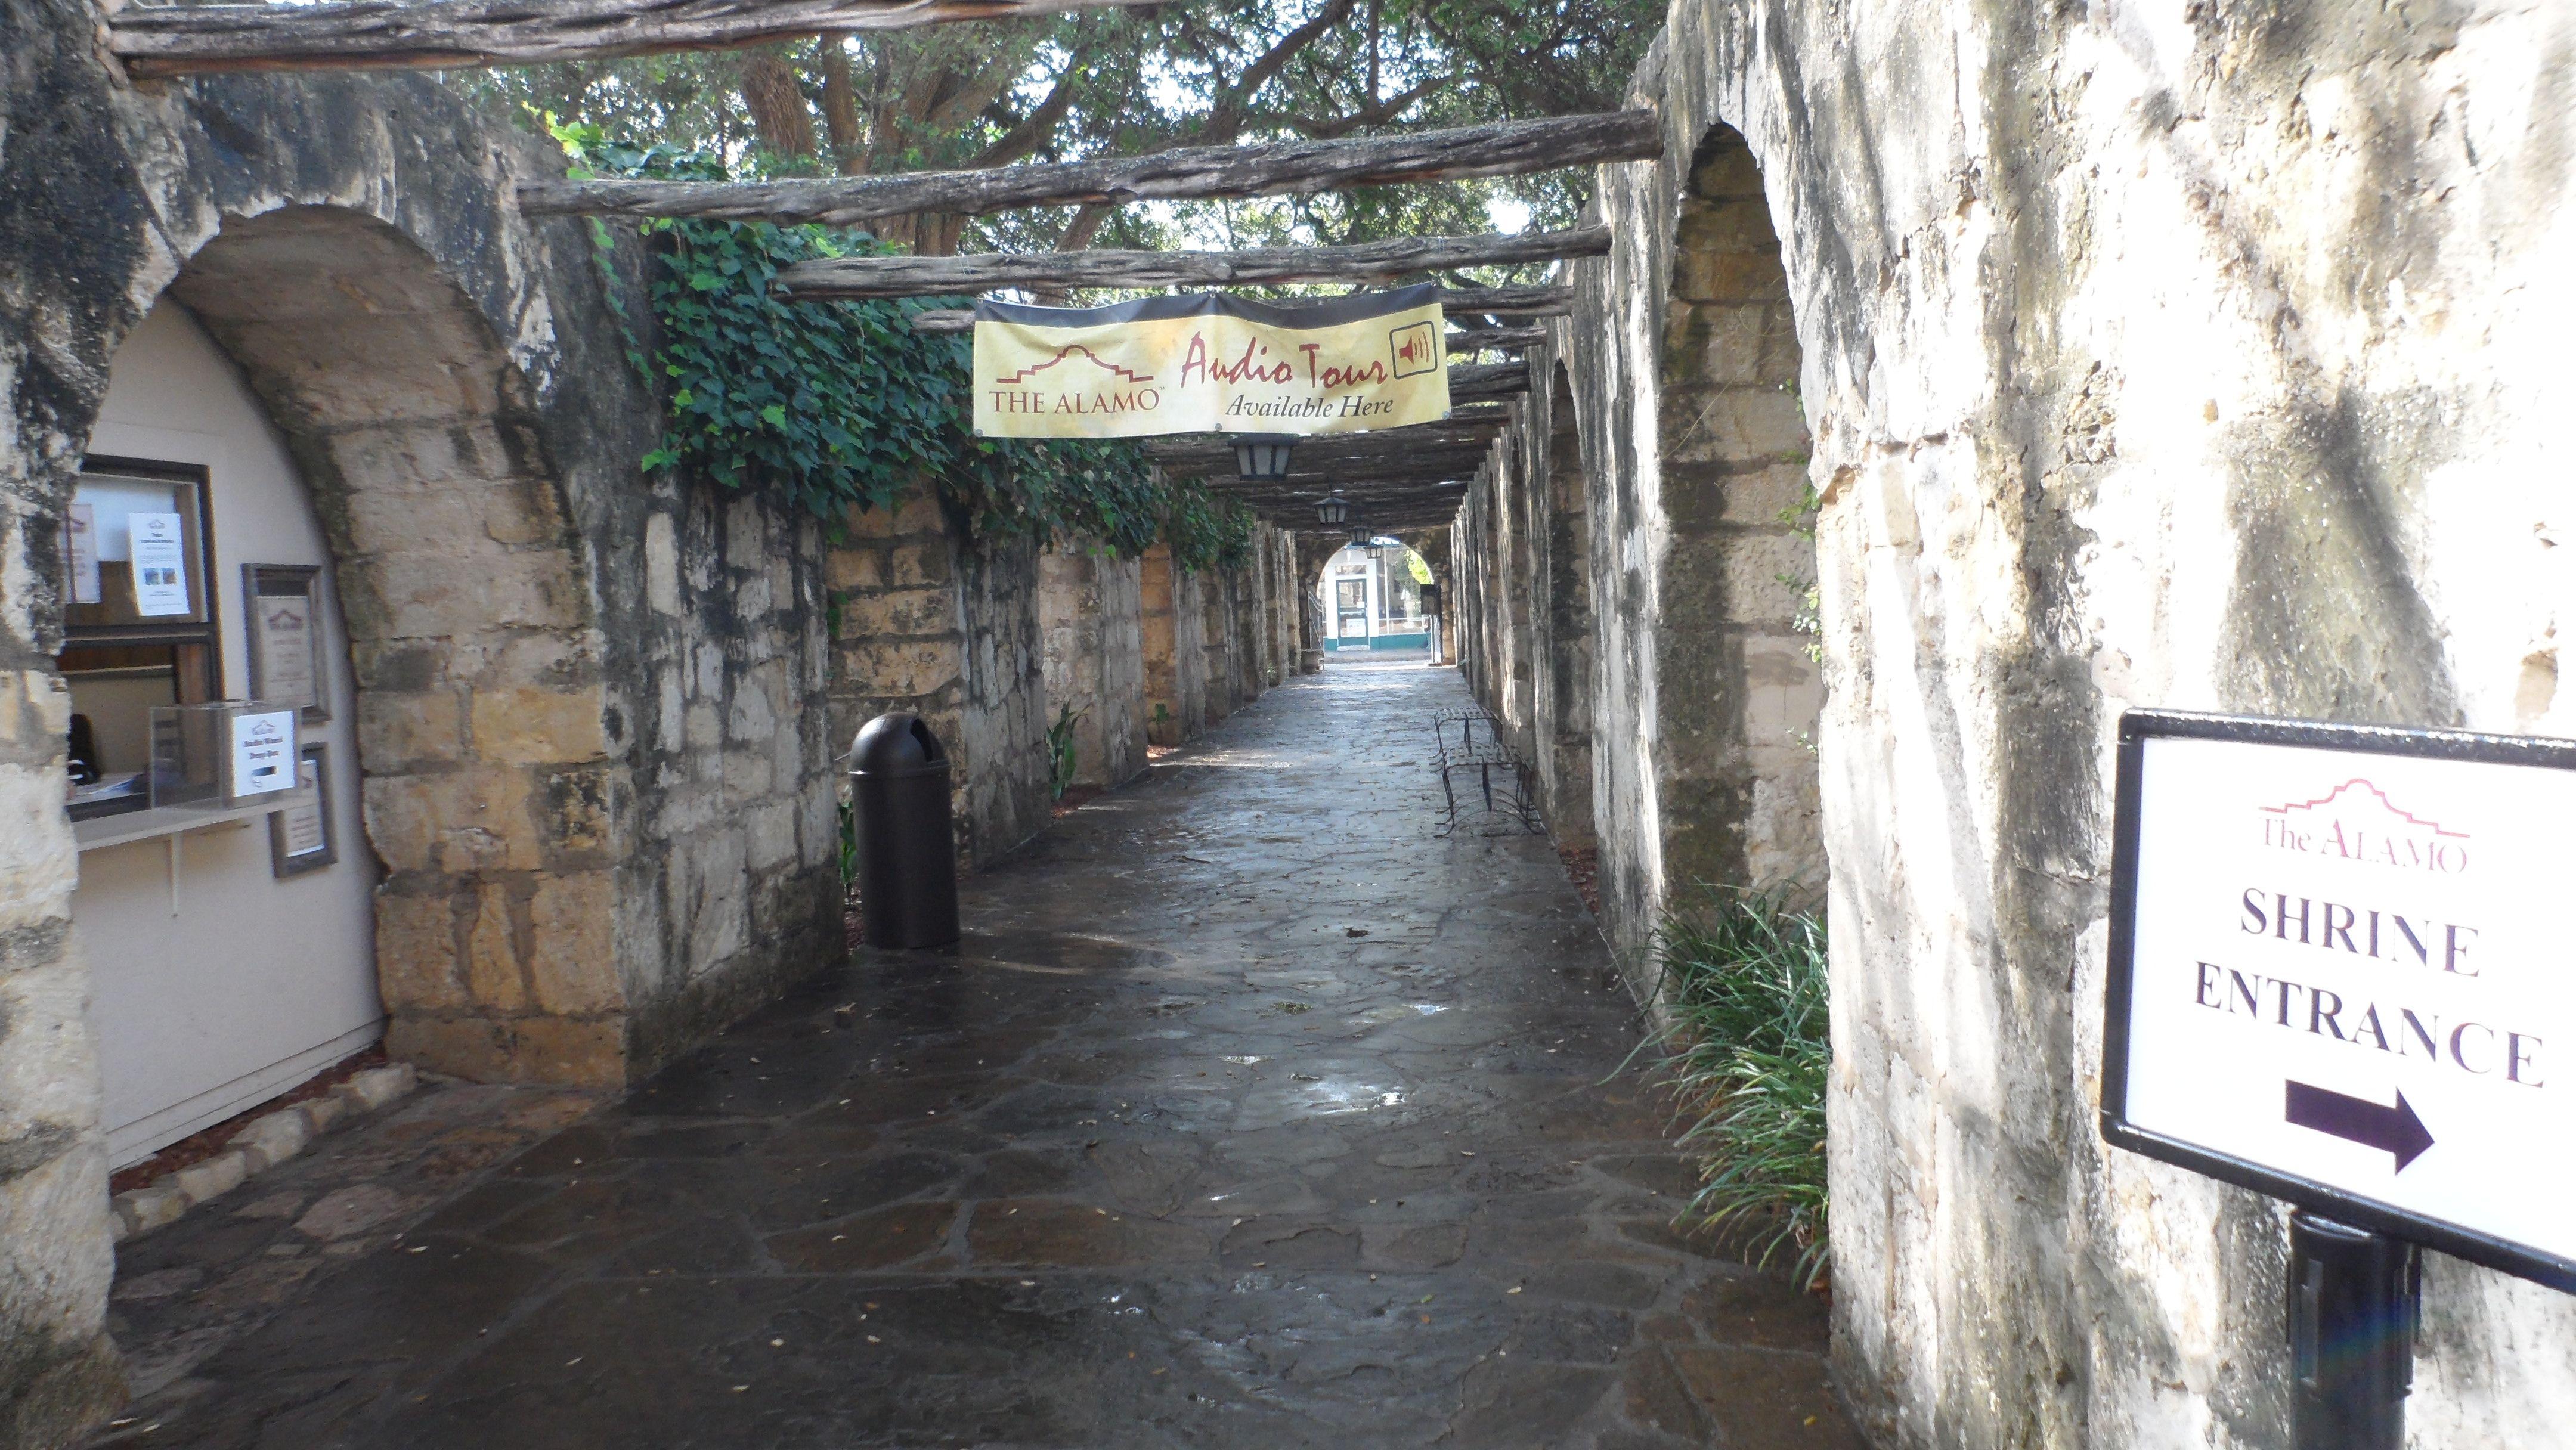 A part of the Alamo garrison